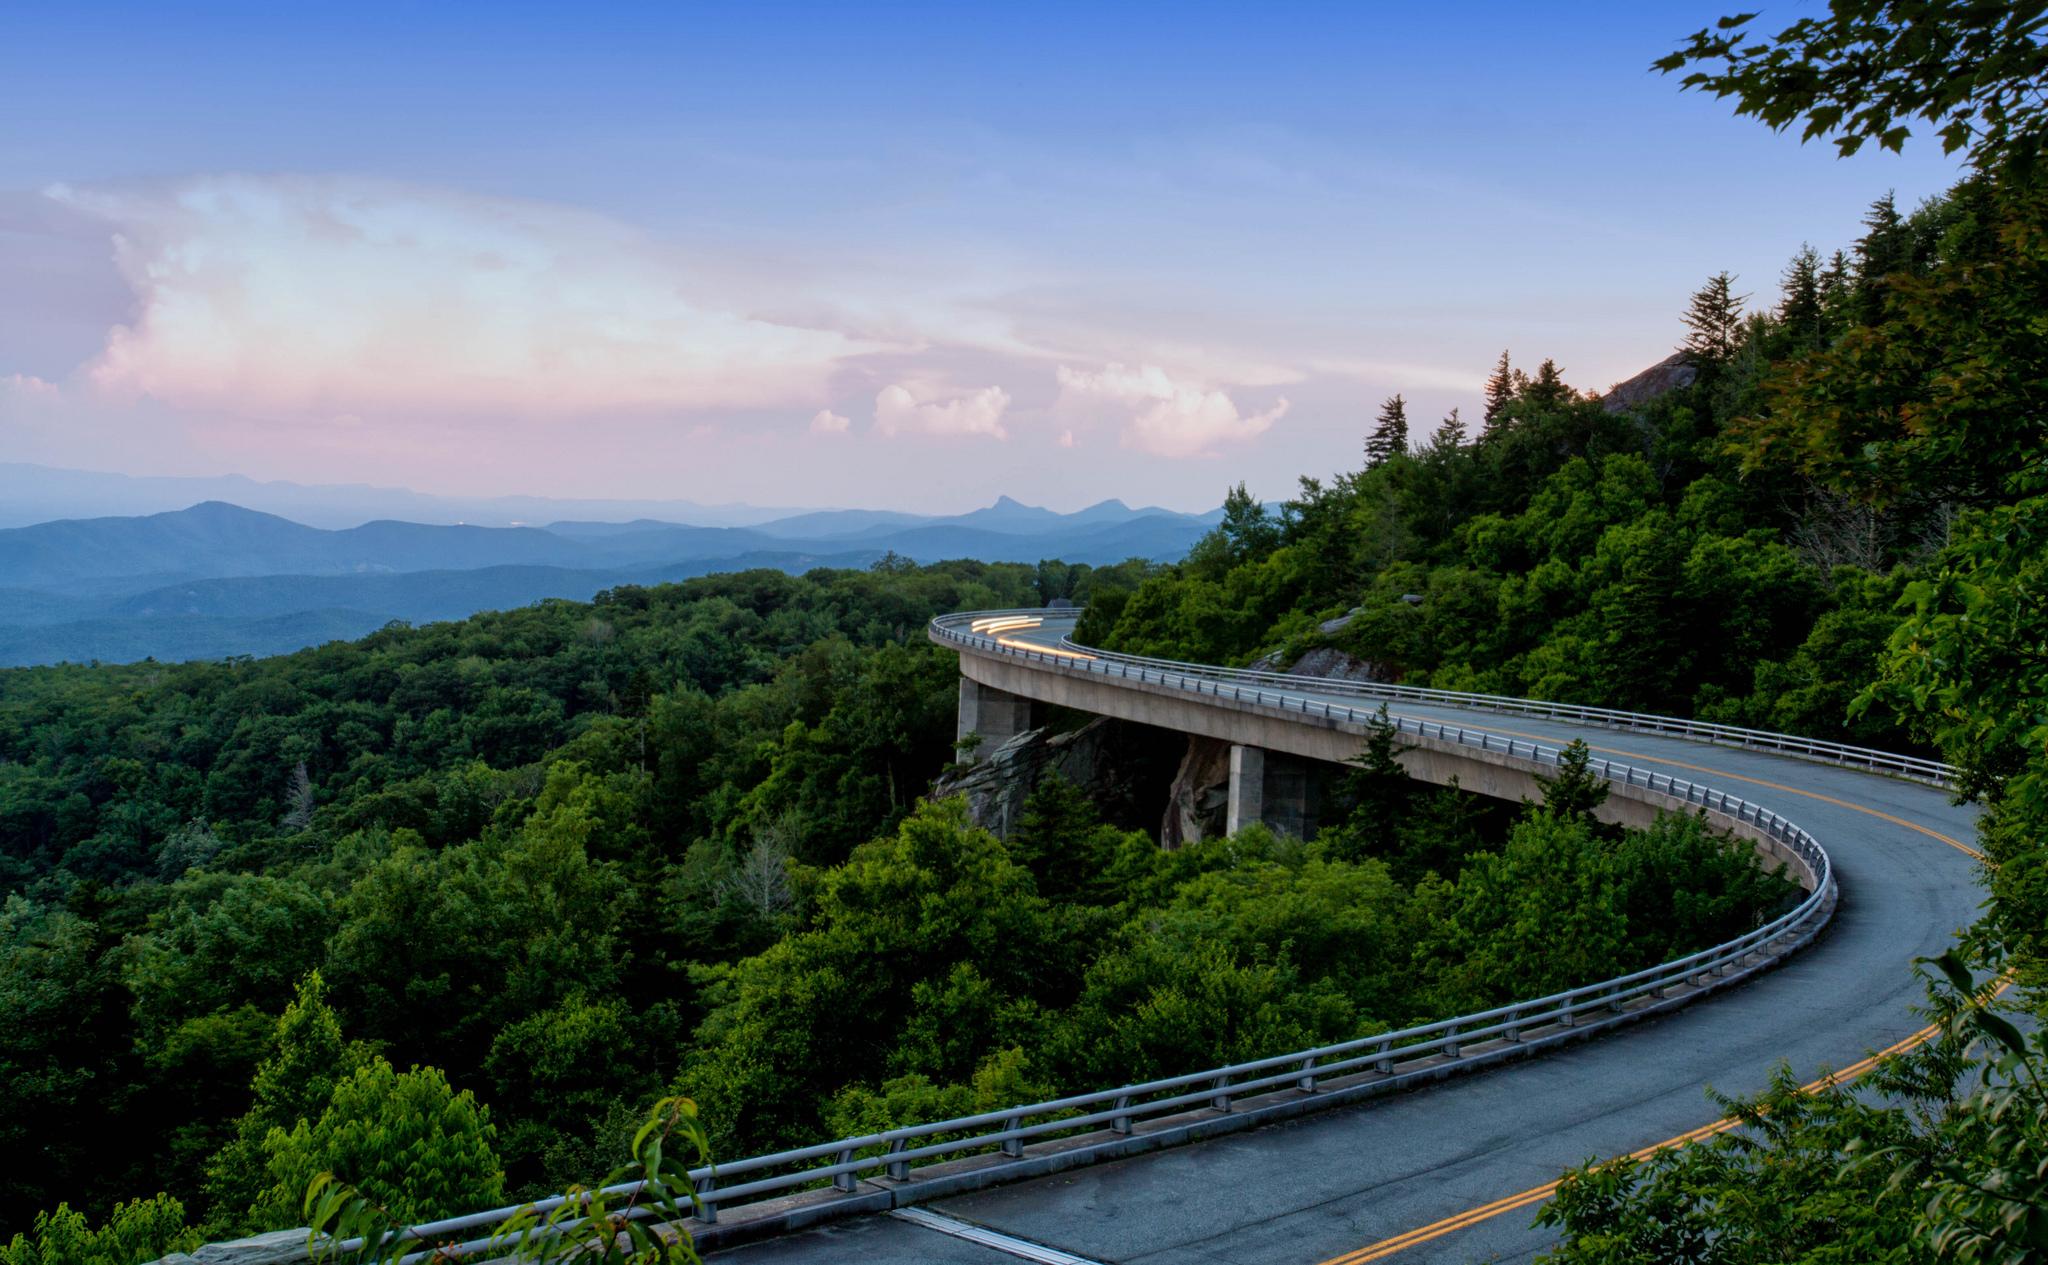 Blue ridge parkway appalachian mountains appalachian mountains 2048x1265